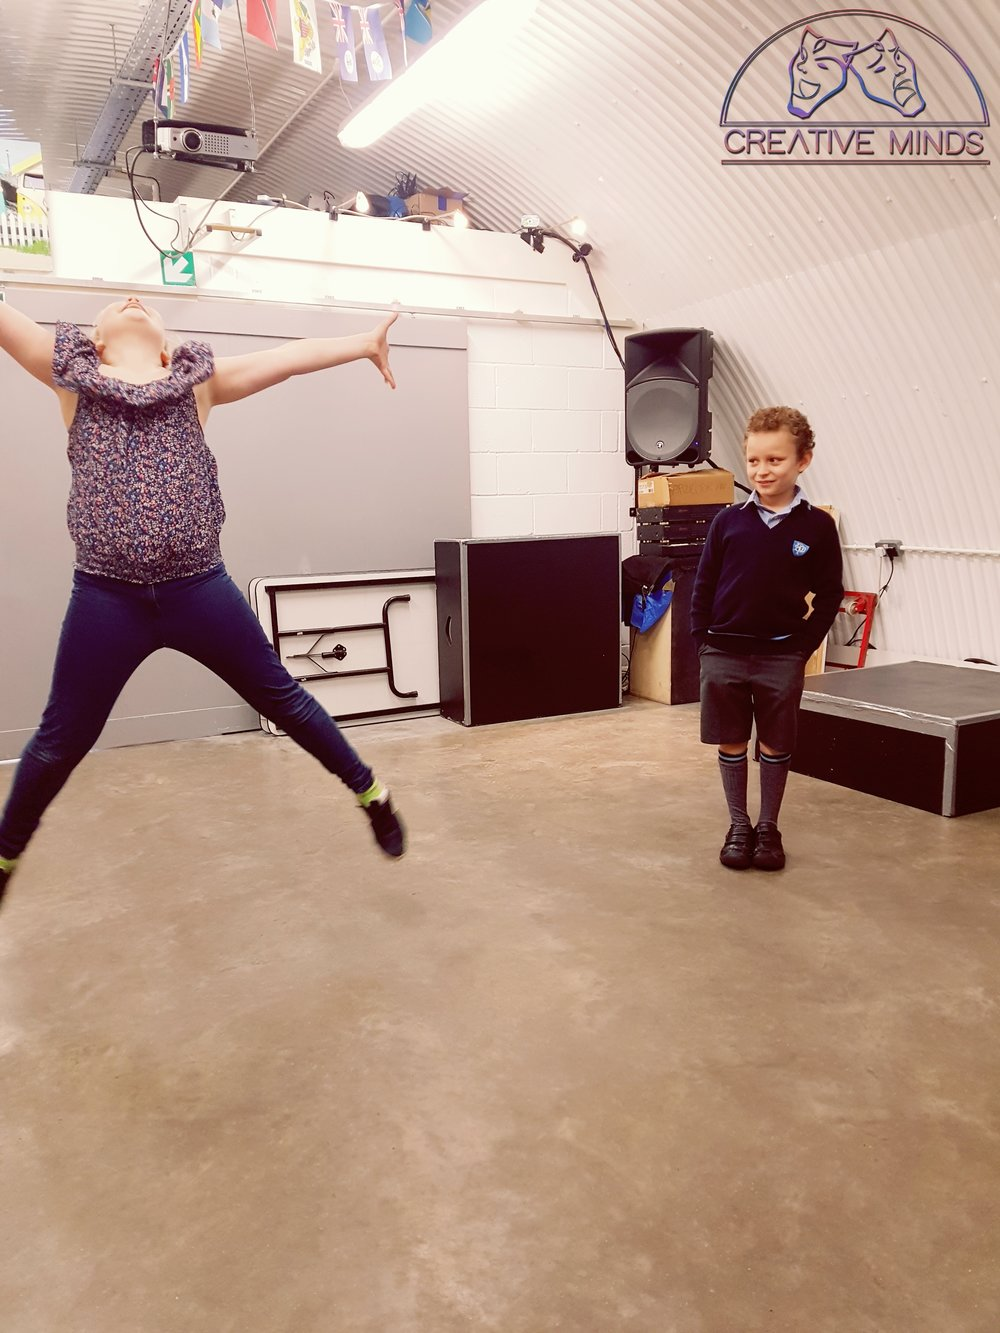 Creative Minds London Performance School in Herne Hill 2.jpg